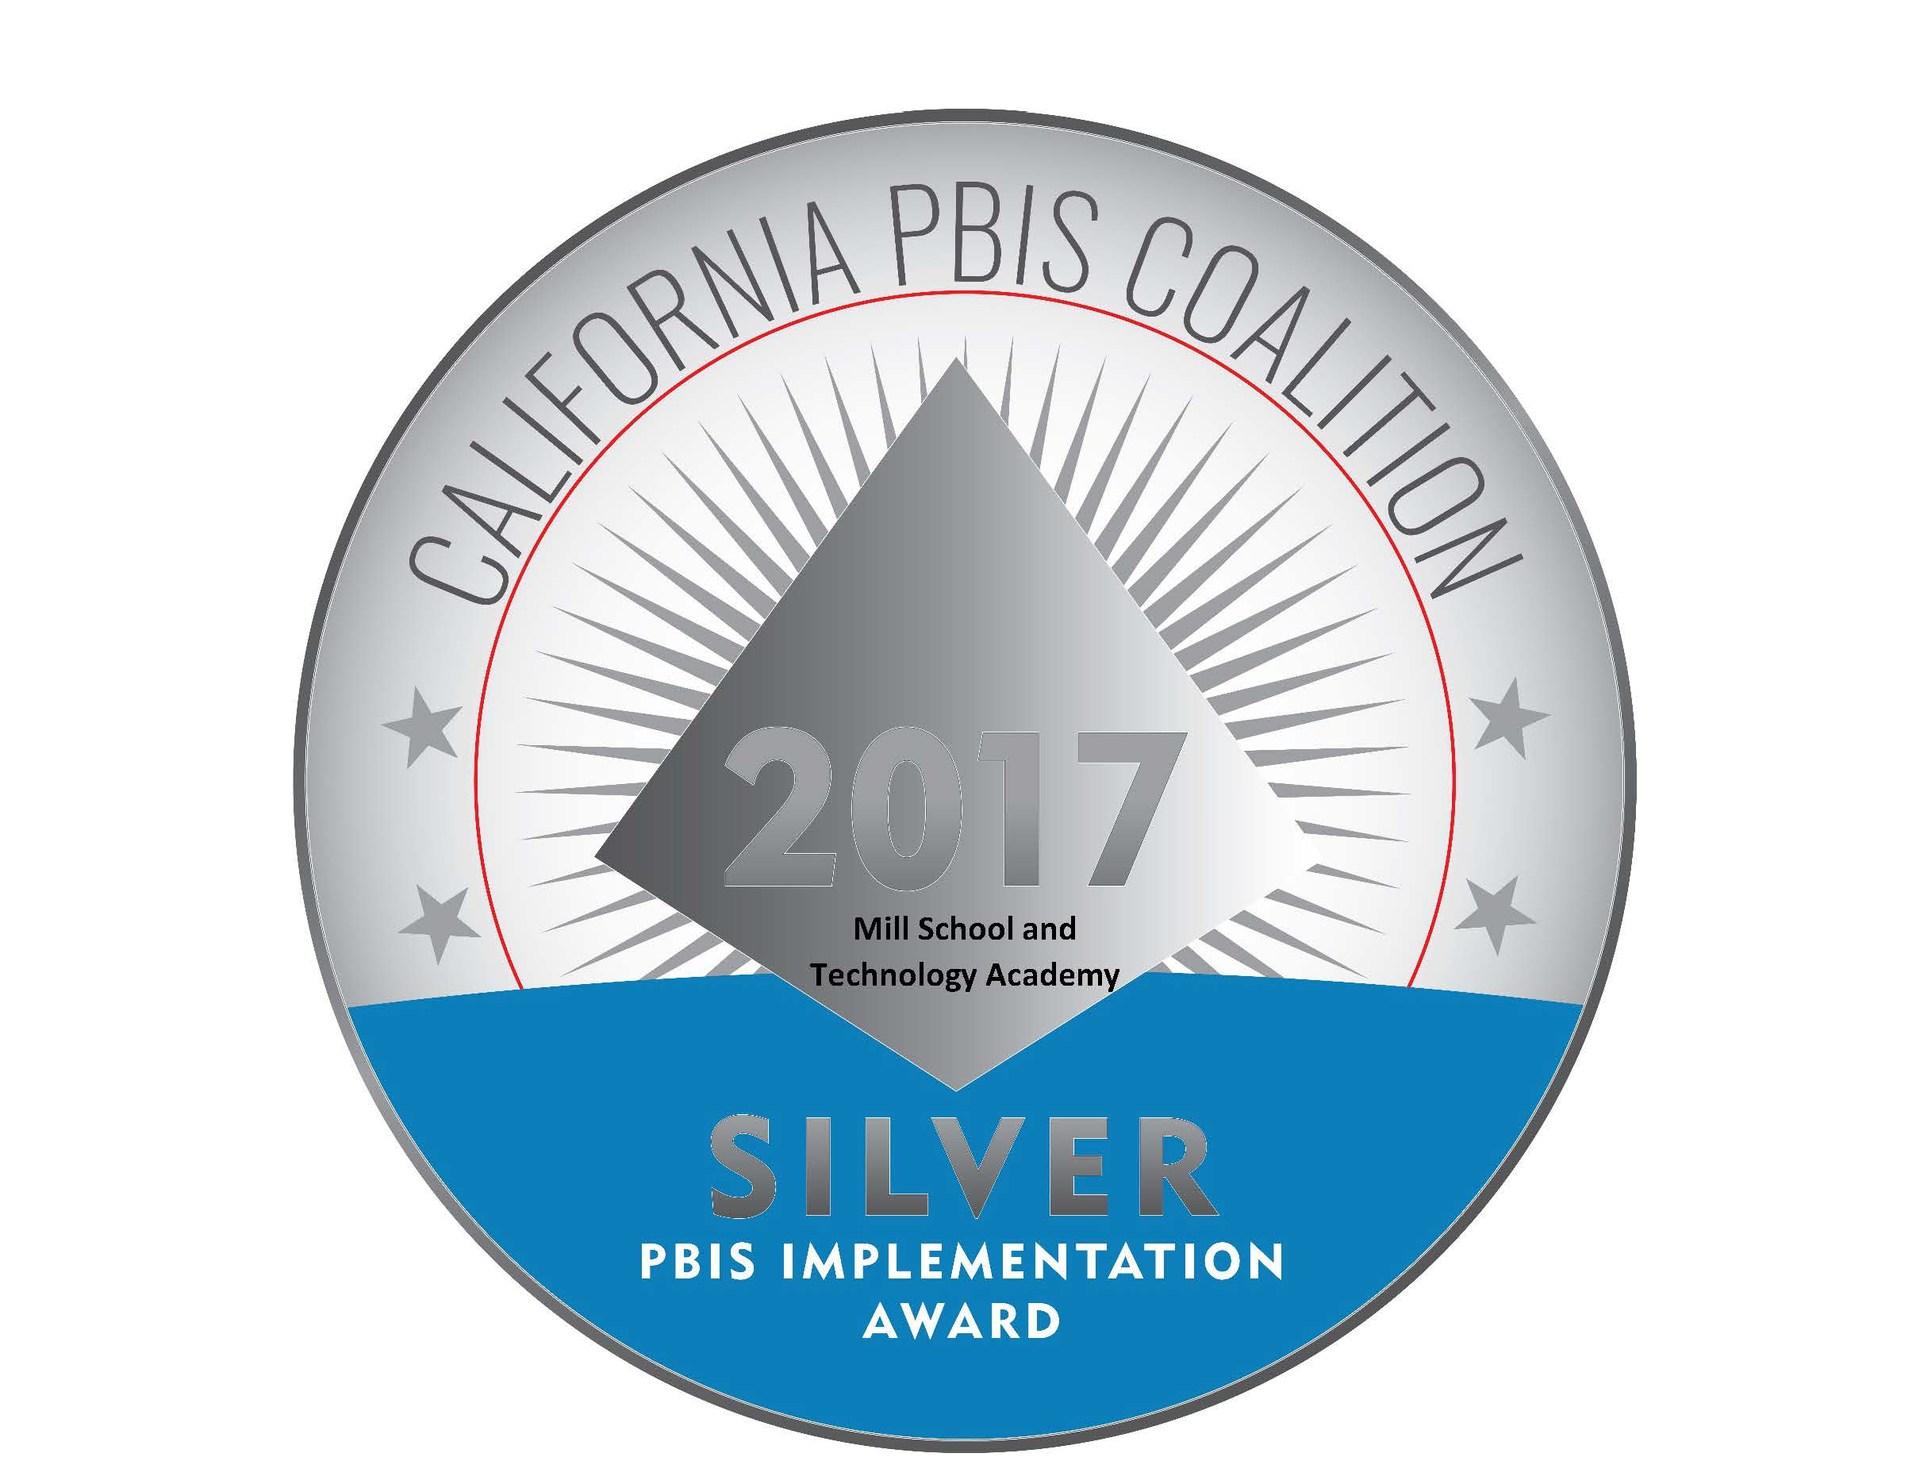 PBIS Silver Award